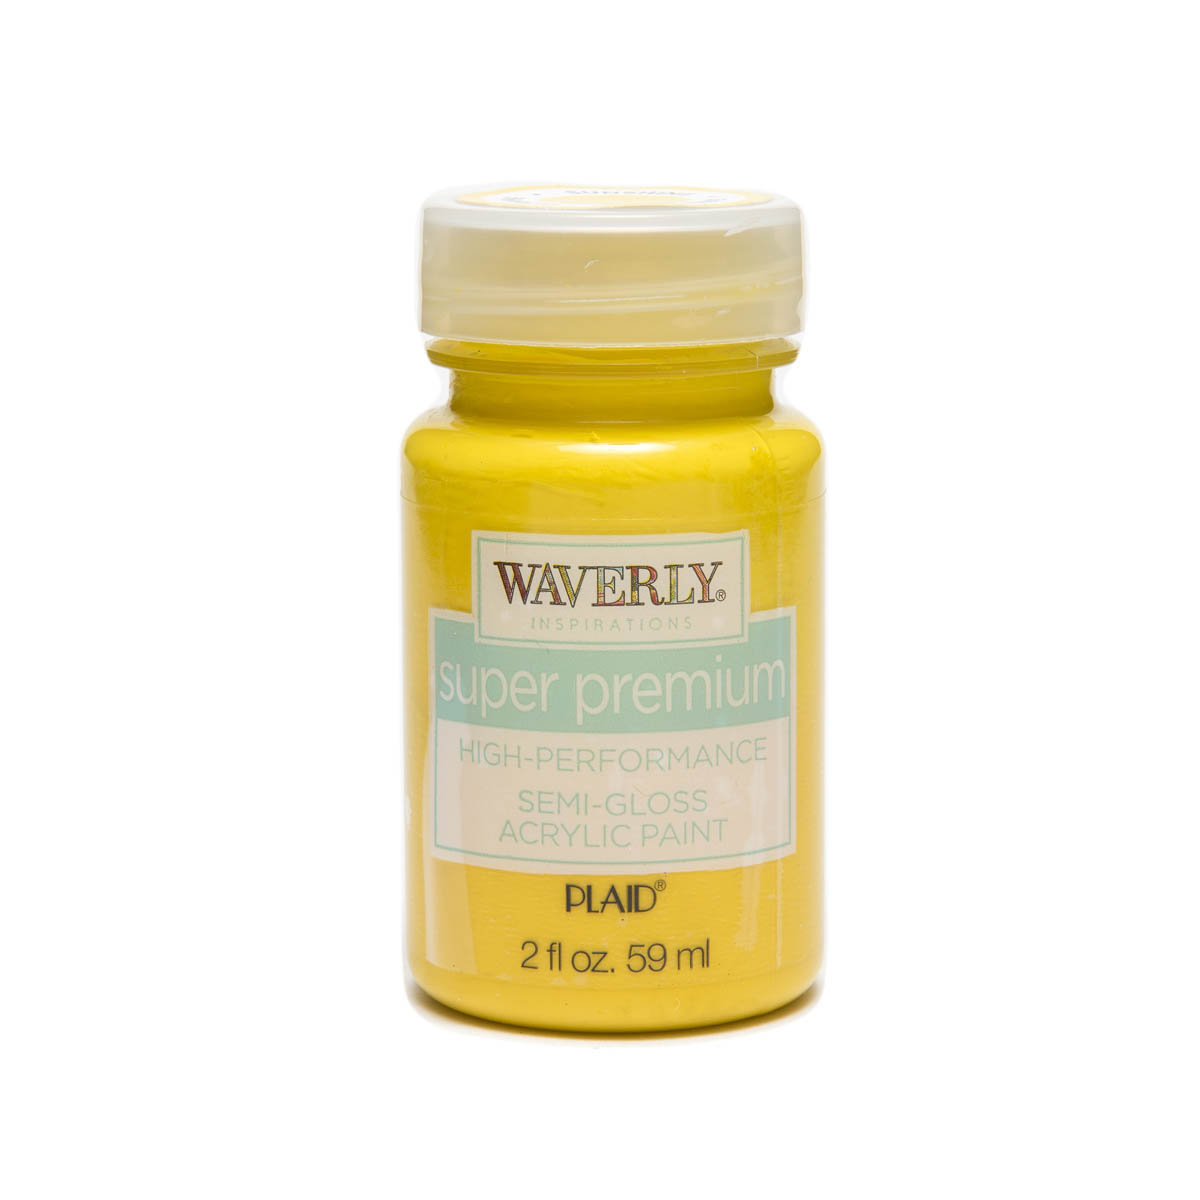 Waverly ® Inspirations Super Premium Semi-Gloss Acrylic Paint - Sunshine, 2 oz.